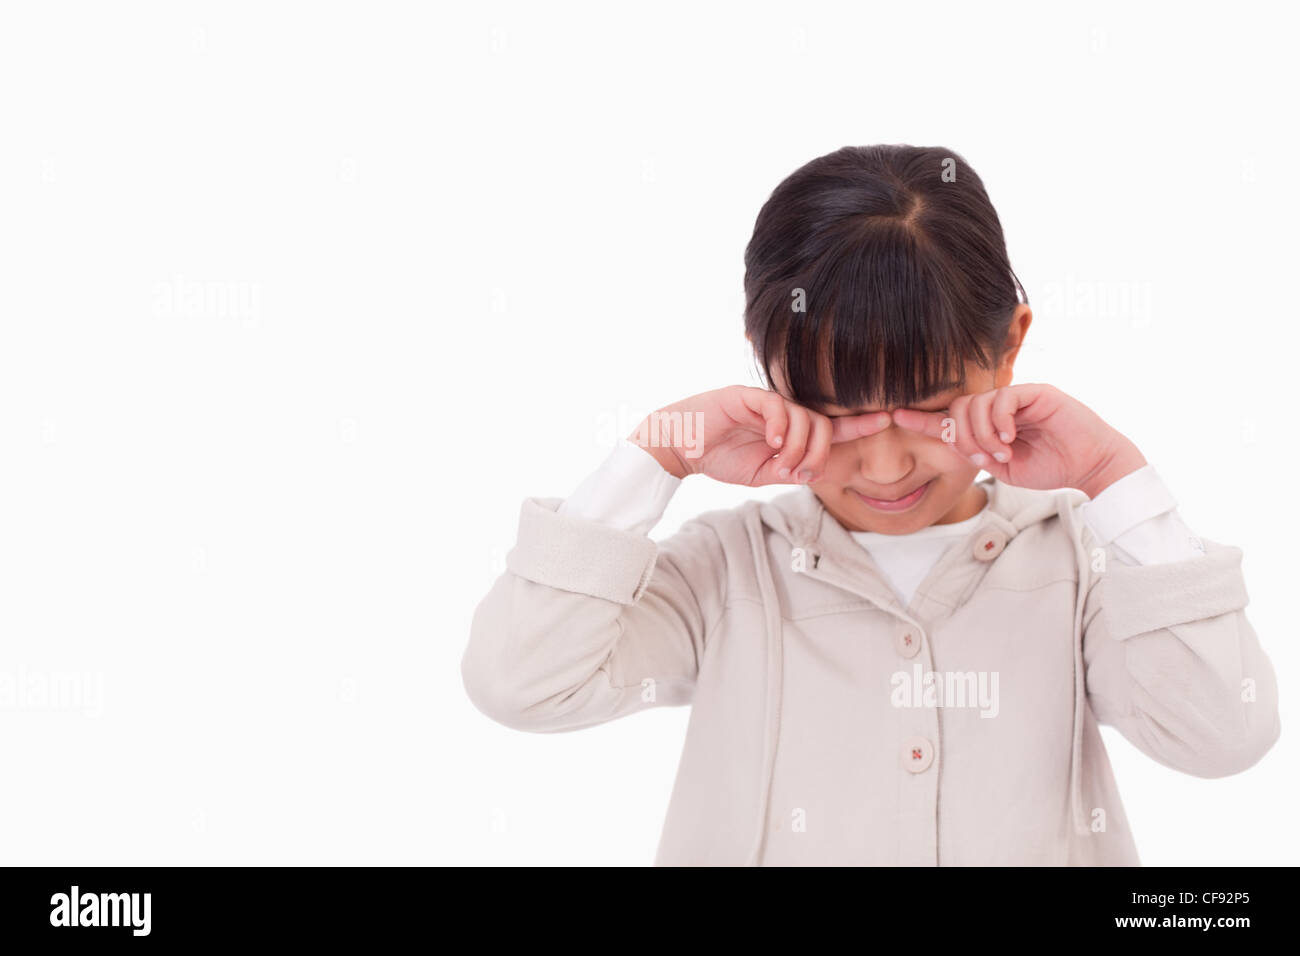 Little girl crying - Stock Image